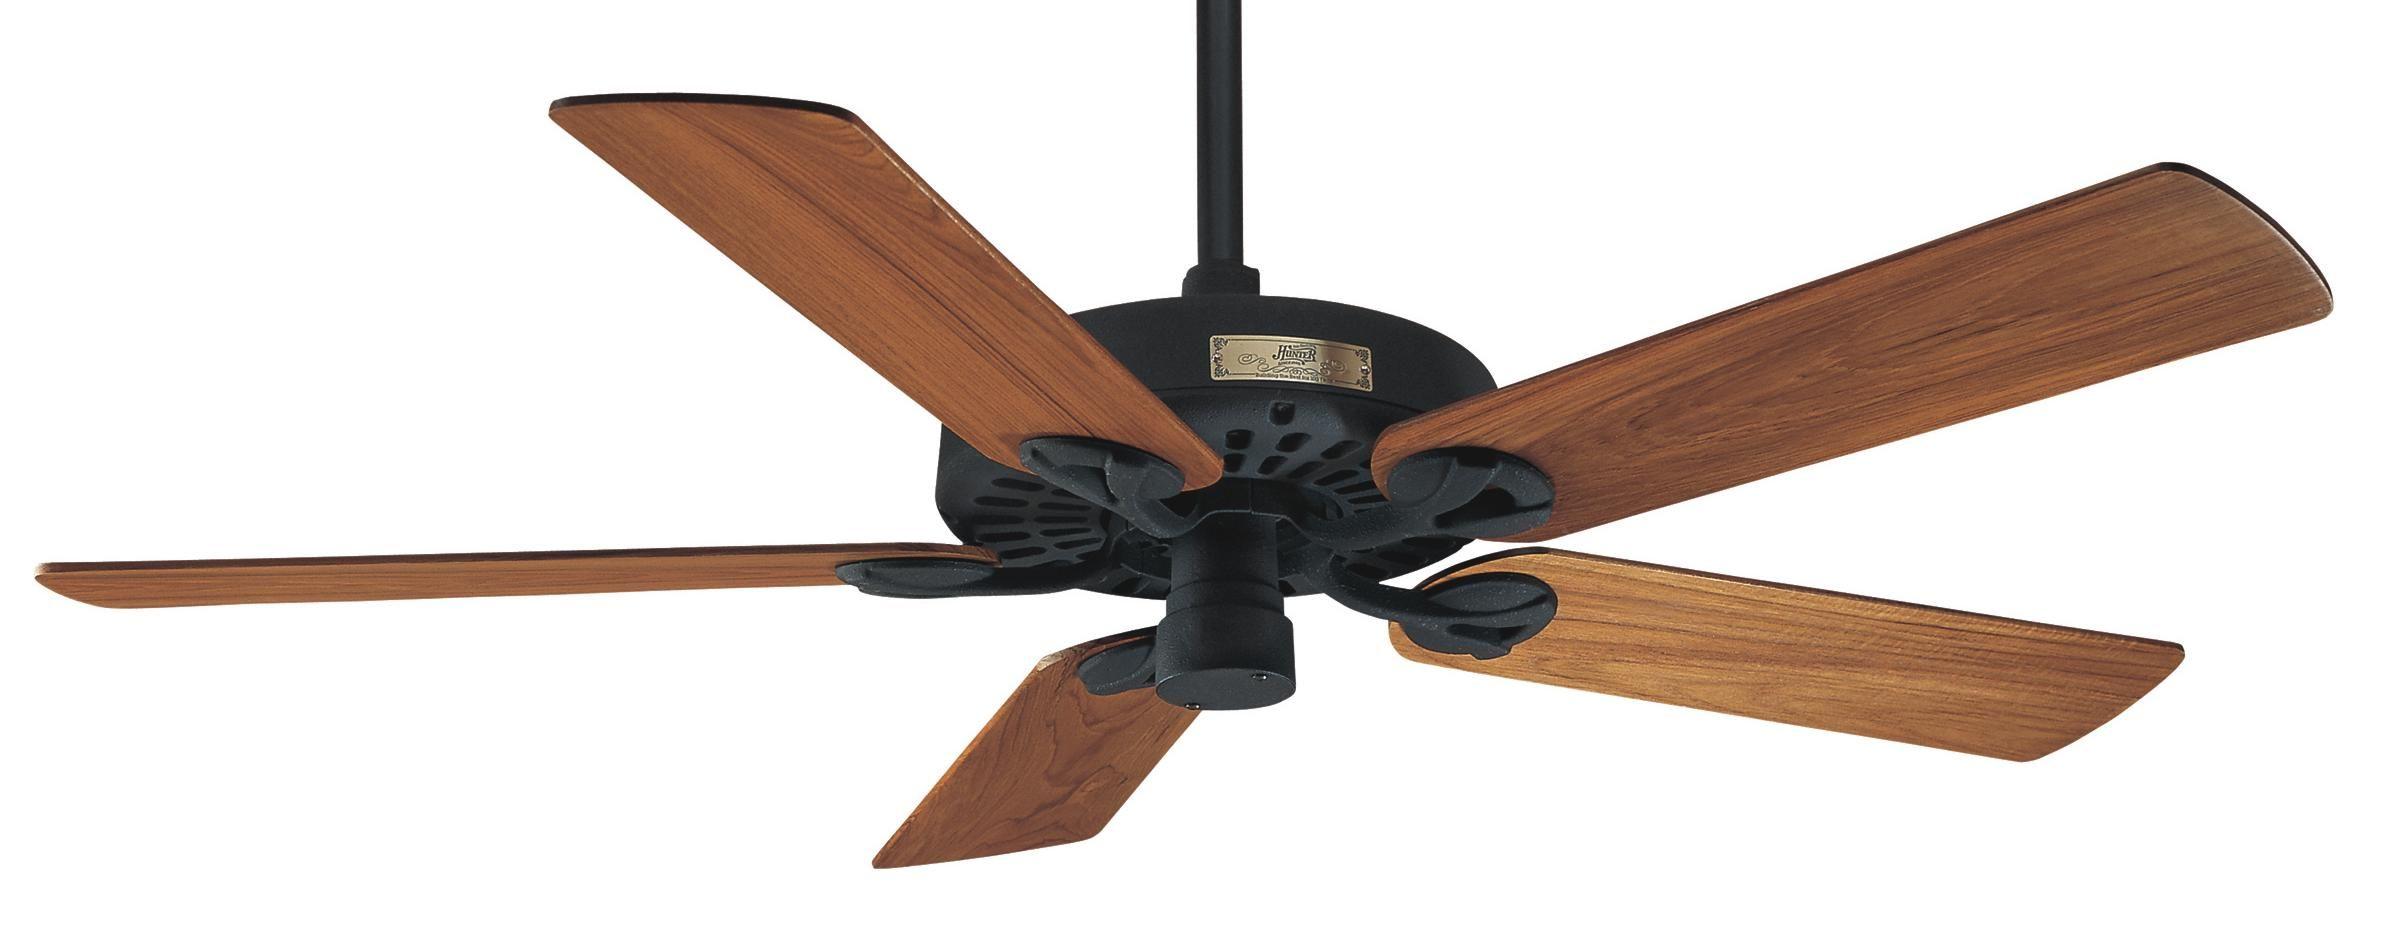 Hunter Outdoor Original Individual Elements 25601 Airflow Rating 7501 Cfm Cubic Feet Per Minute Black Ceiling Fan Ceiling Fan Outdoor Ceiling Fans